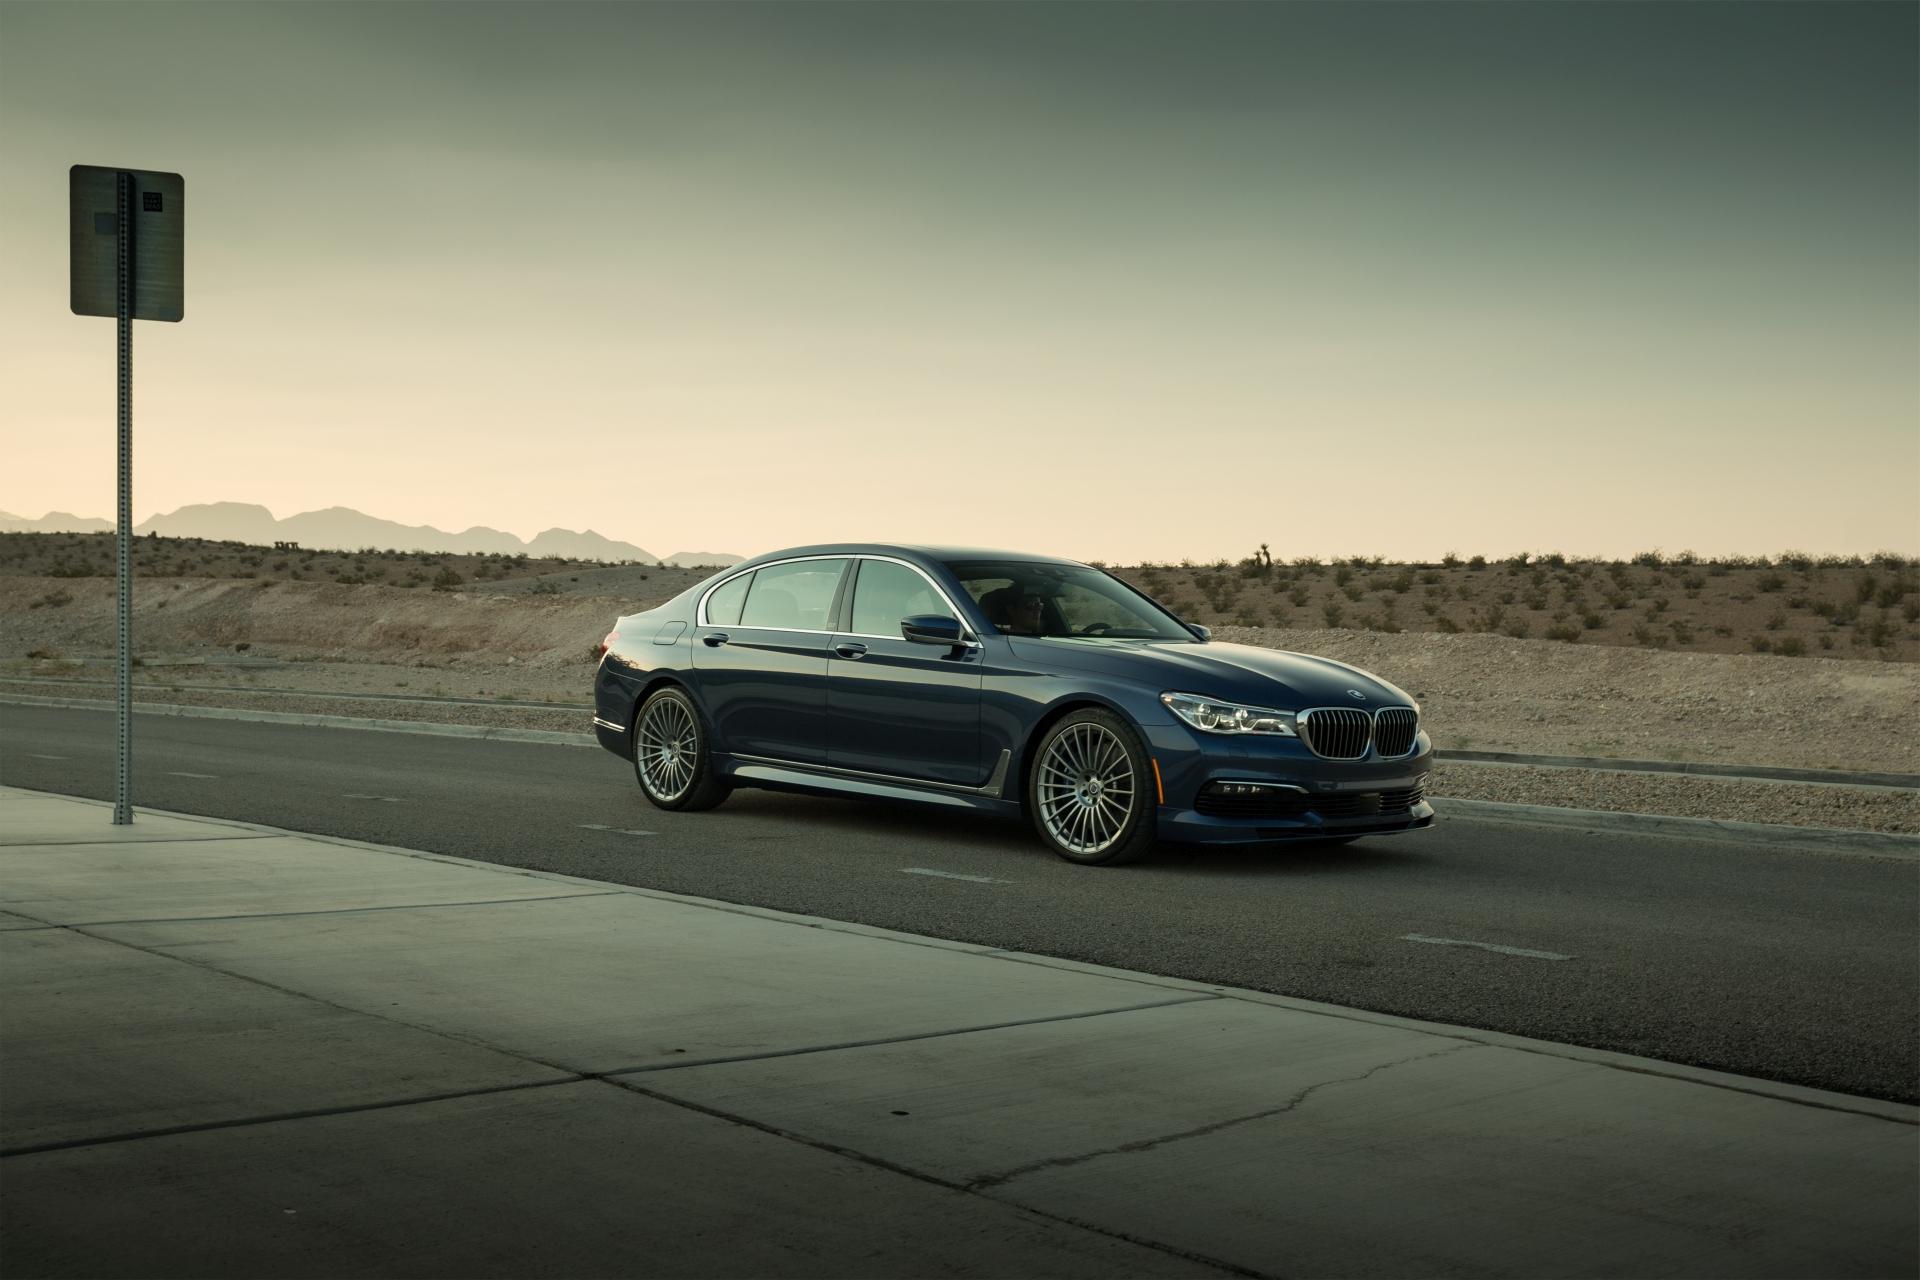 Wallpapers 2017 BMW Alpina B7 xDrive Stars in New Photoshoot 1920x1280